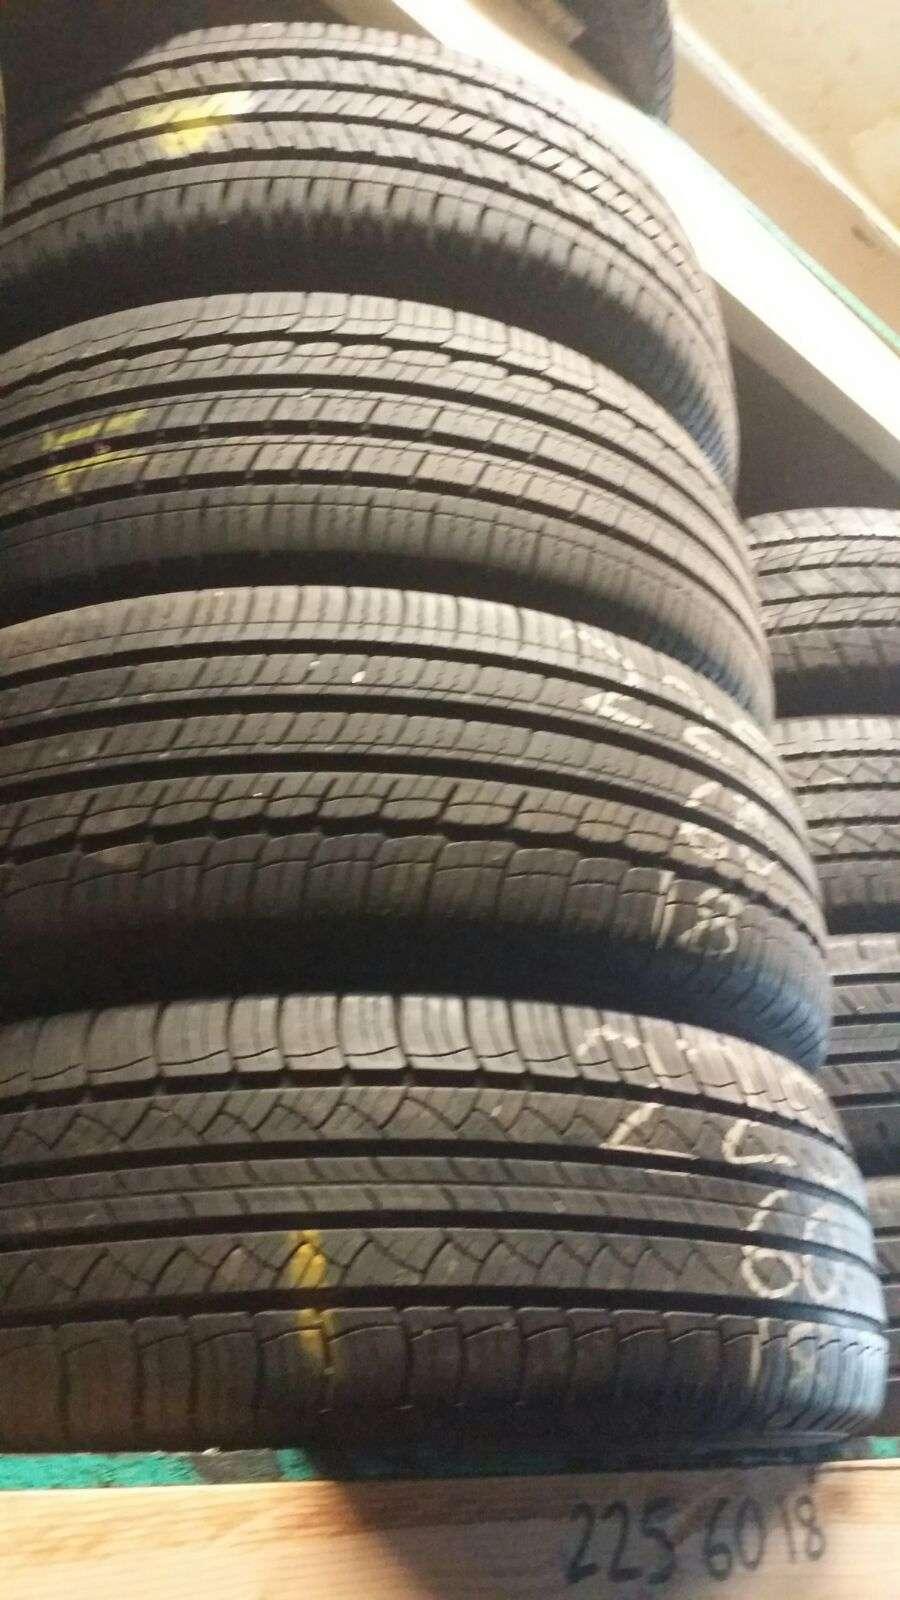 Lindenwold Tire Center - car repair  | Photo 10 of 10 | Address: 500 E Gibbsboro Rd, Lindenwold, NJ 08021, USA | Phone: (856) 426-5635